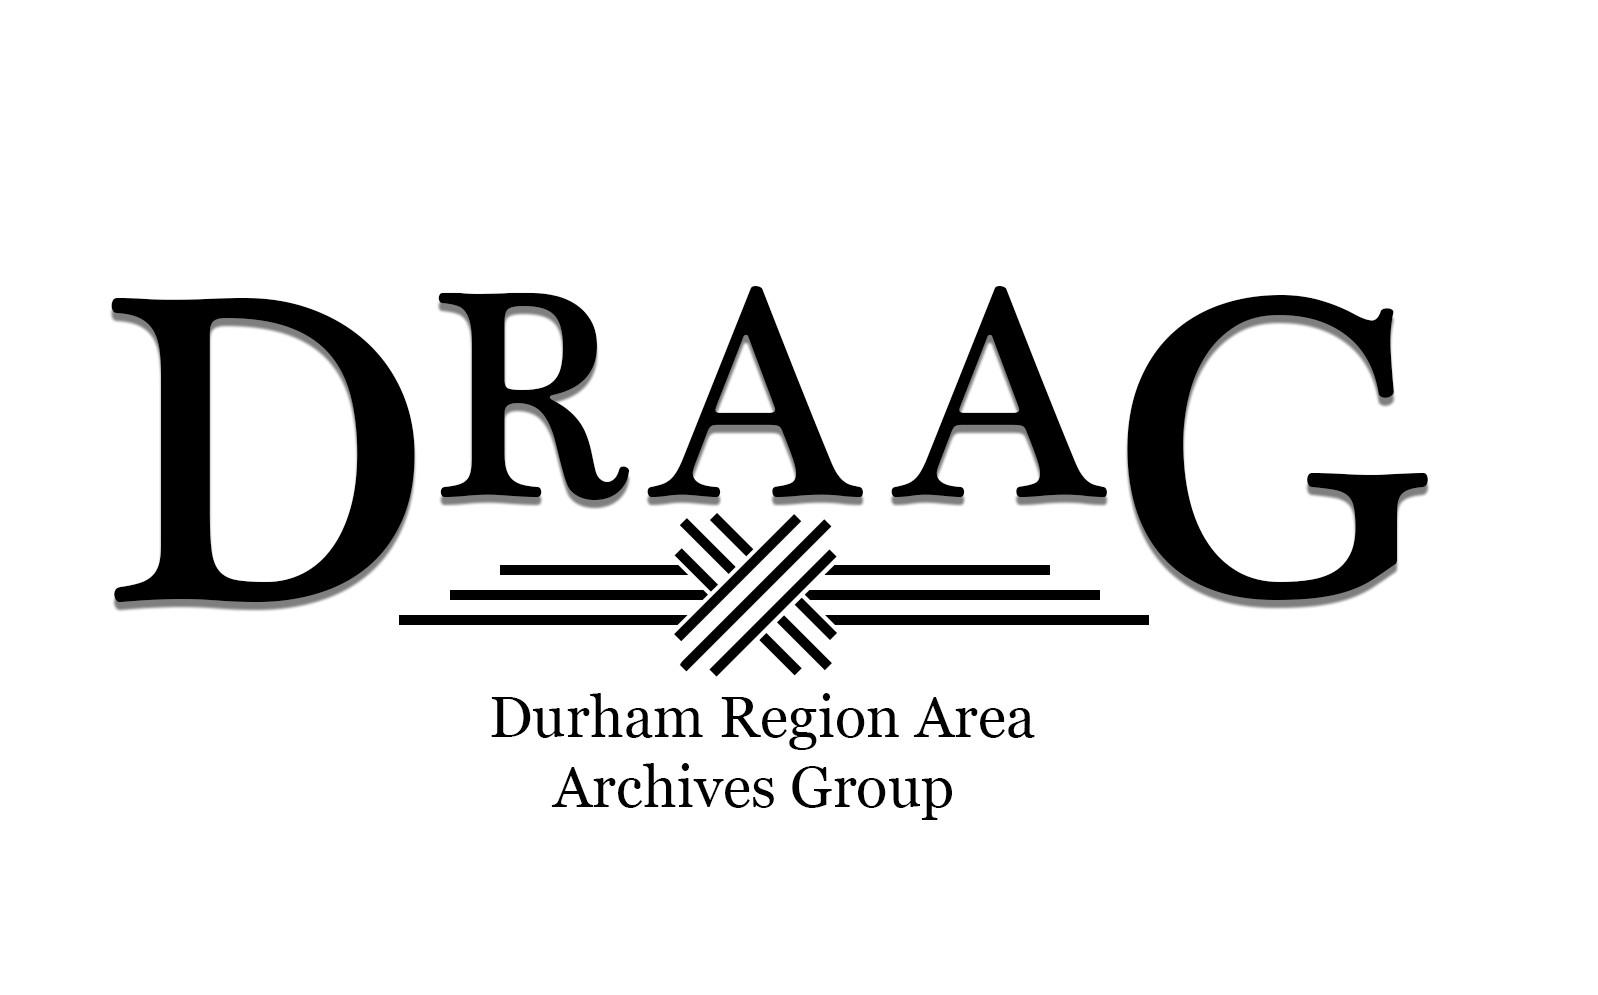 durham region area archives group